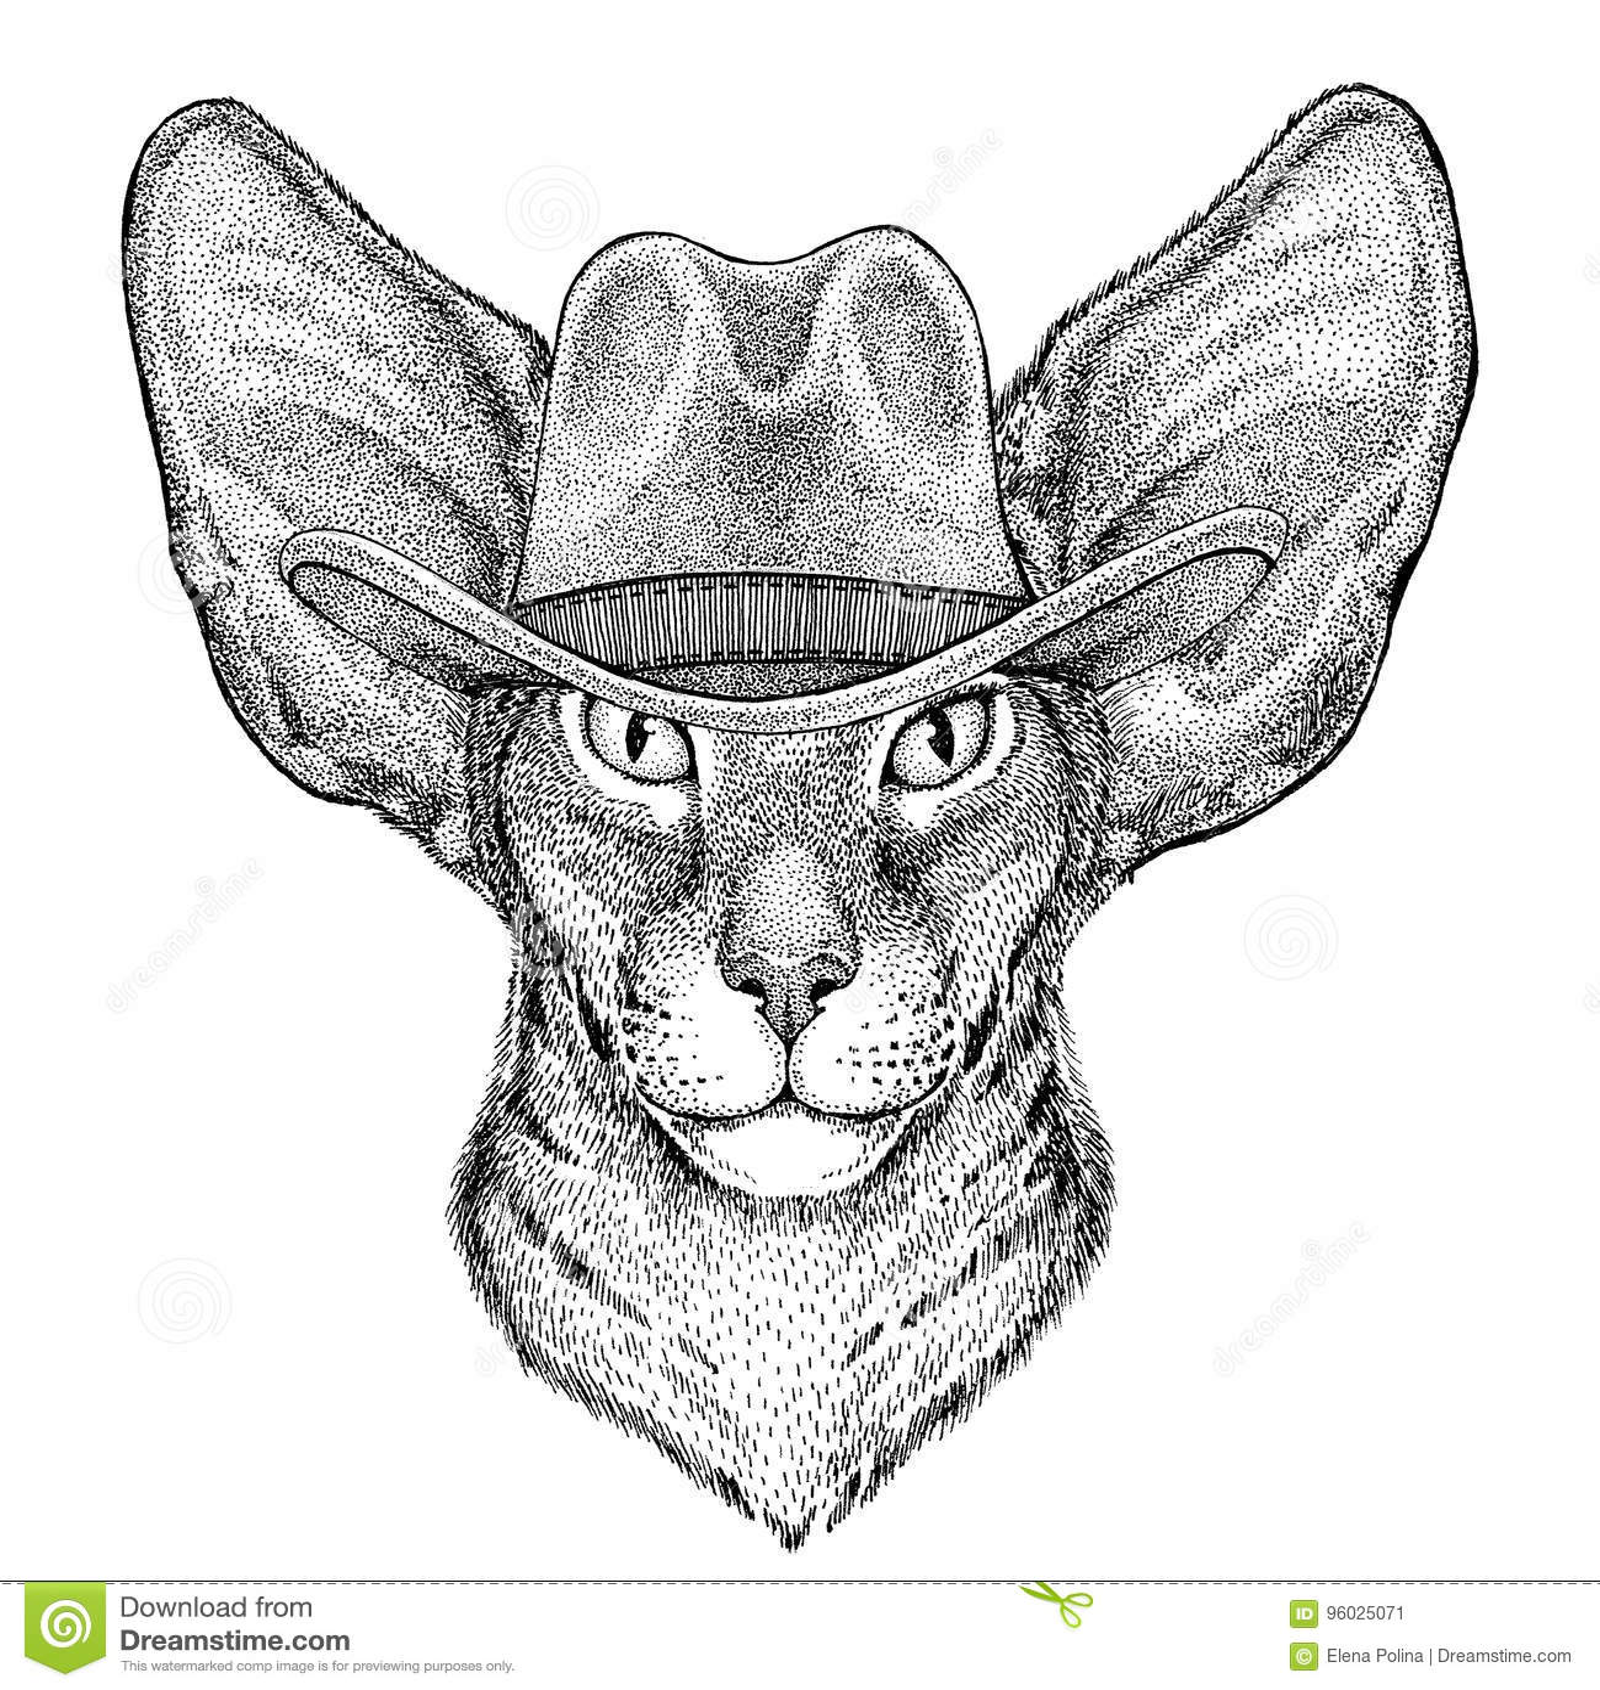 ca803a82 Oriental Cat With Big Ears Wild Animal Wearing Cowboy Hat Wild West ...